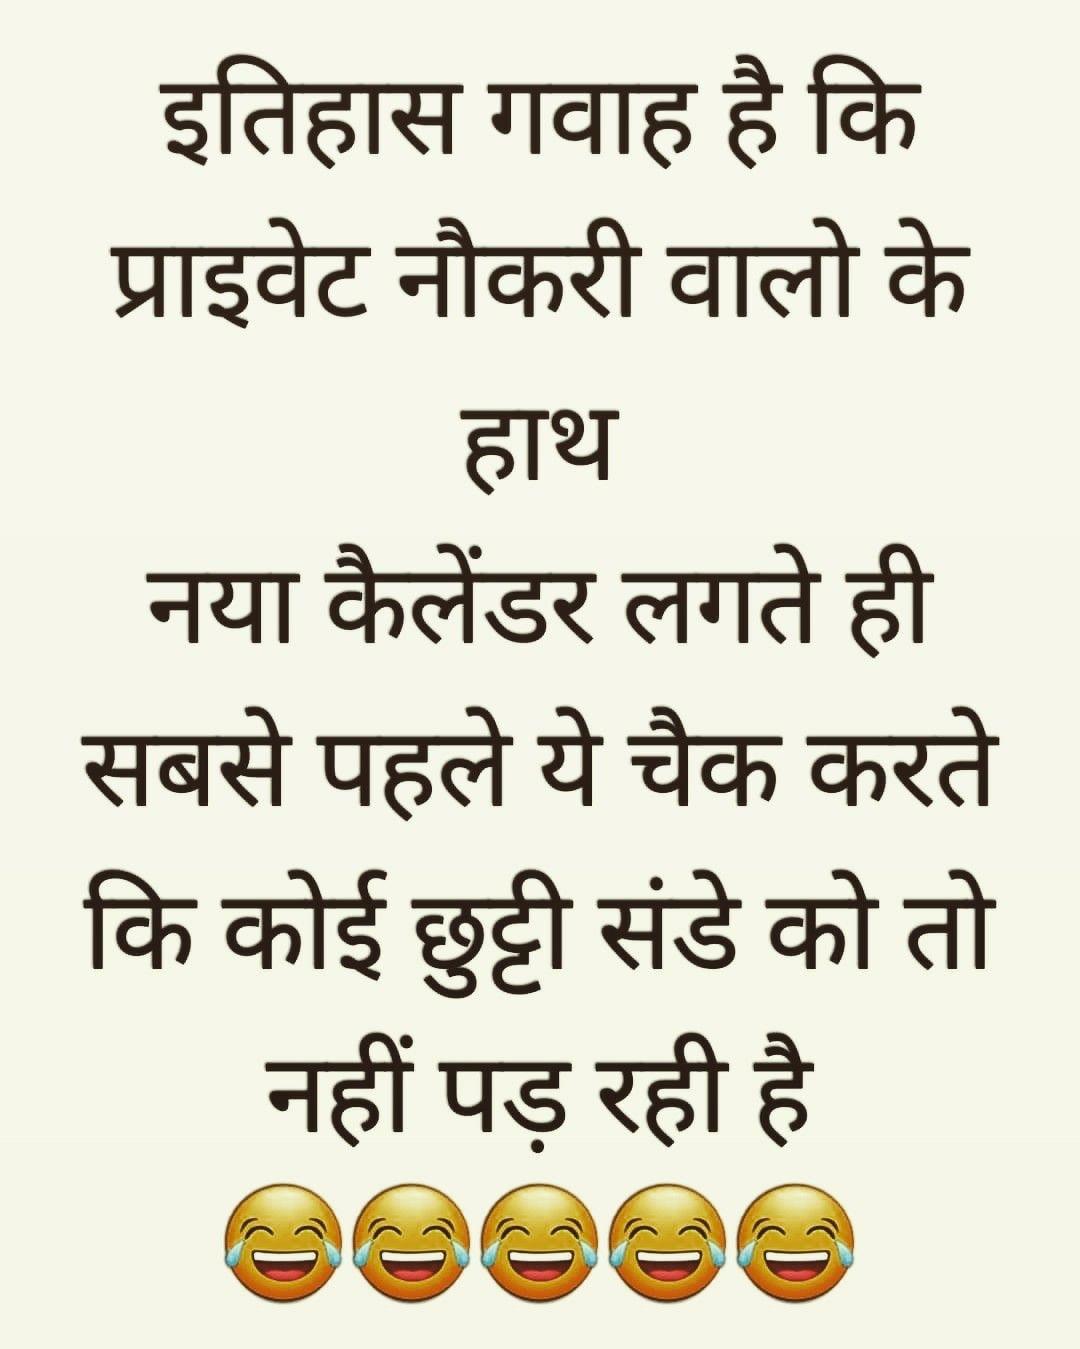 New Year Meme In 2020 New Year Meme Jokes In Hindi Memes